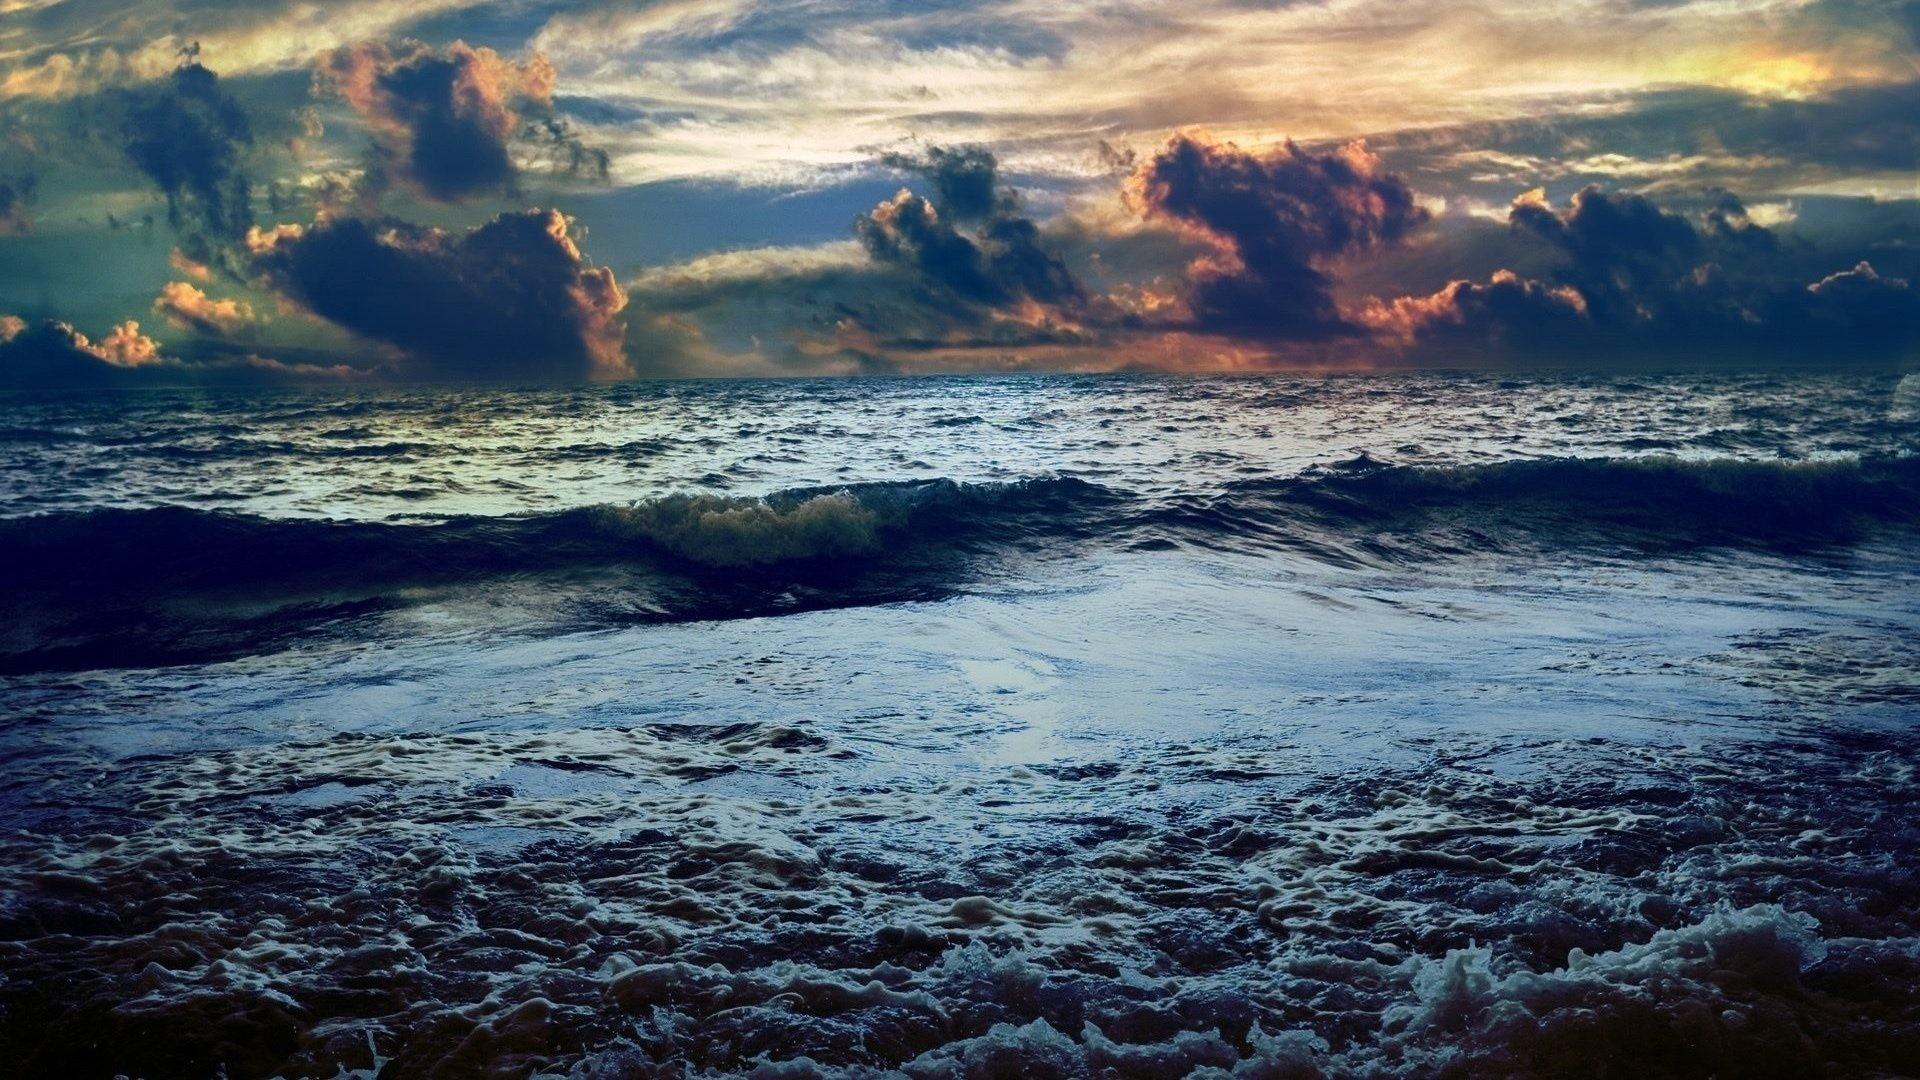 Storm Tag – Waves Beaches Clouds Storm Seascapes Nature Sea Ocean Sky  Horizon Sunrise Sunset Desktop